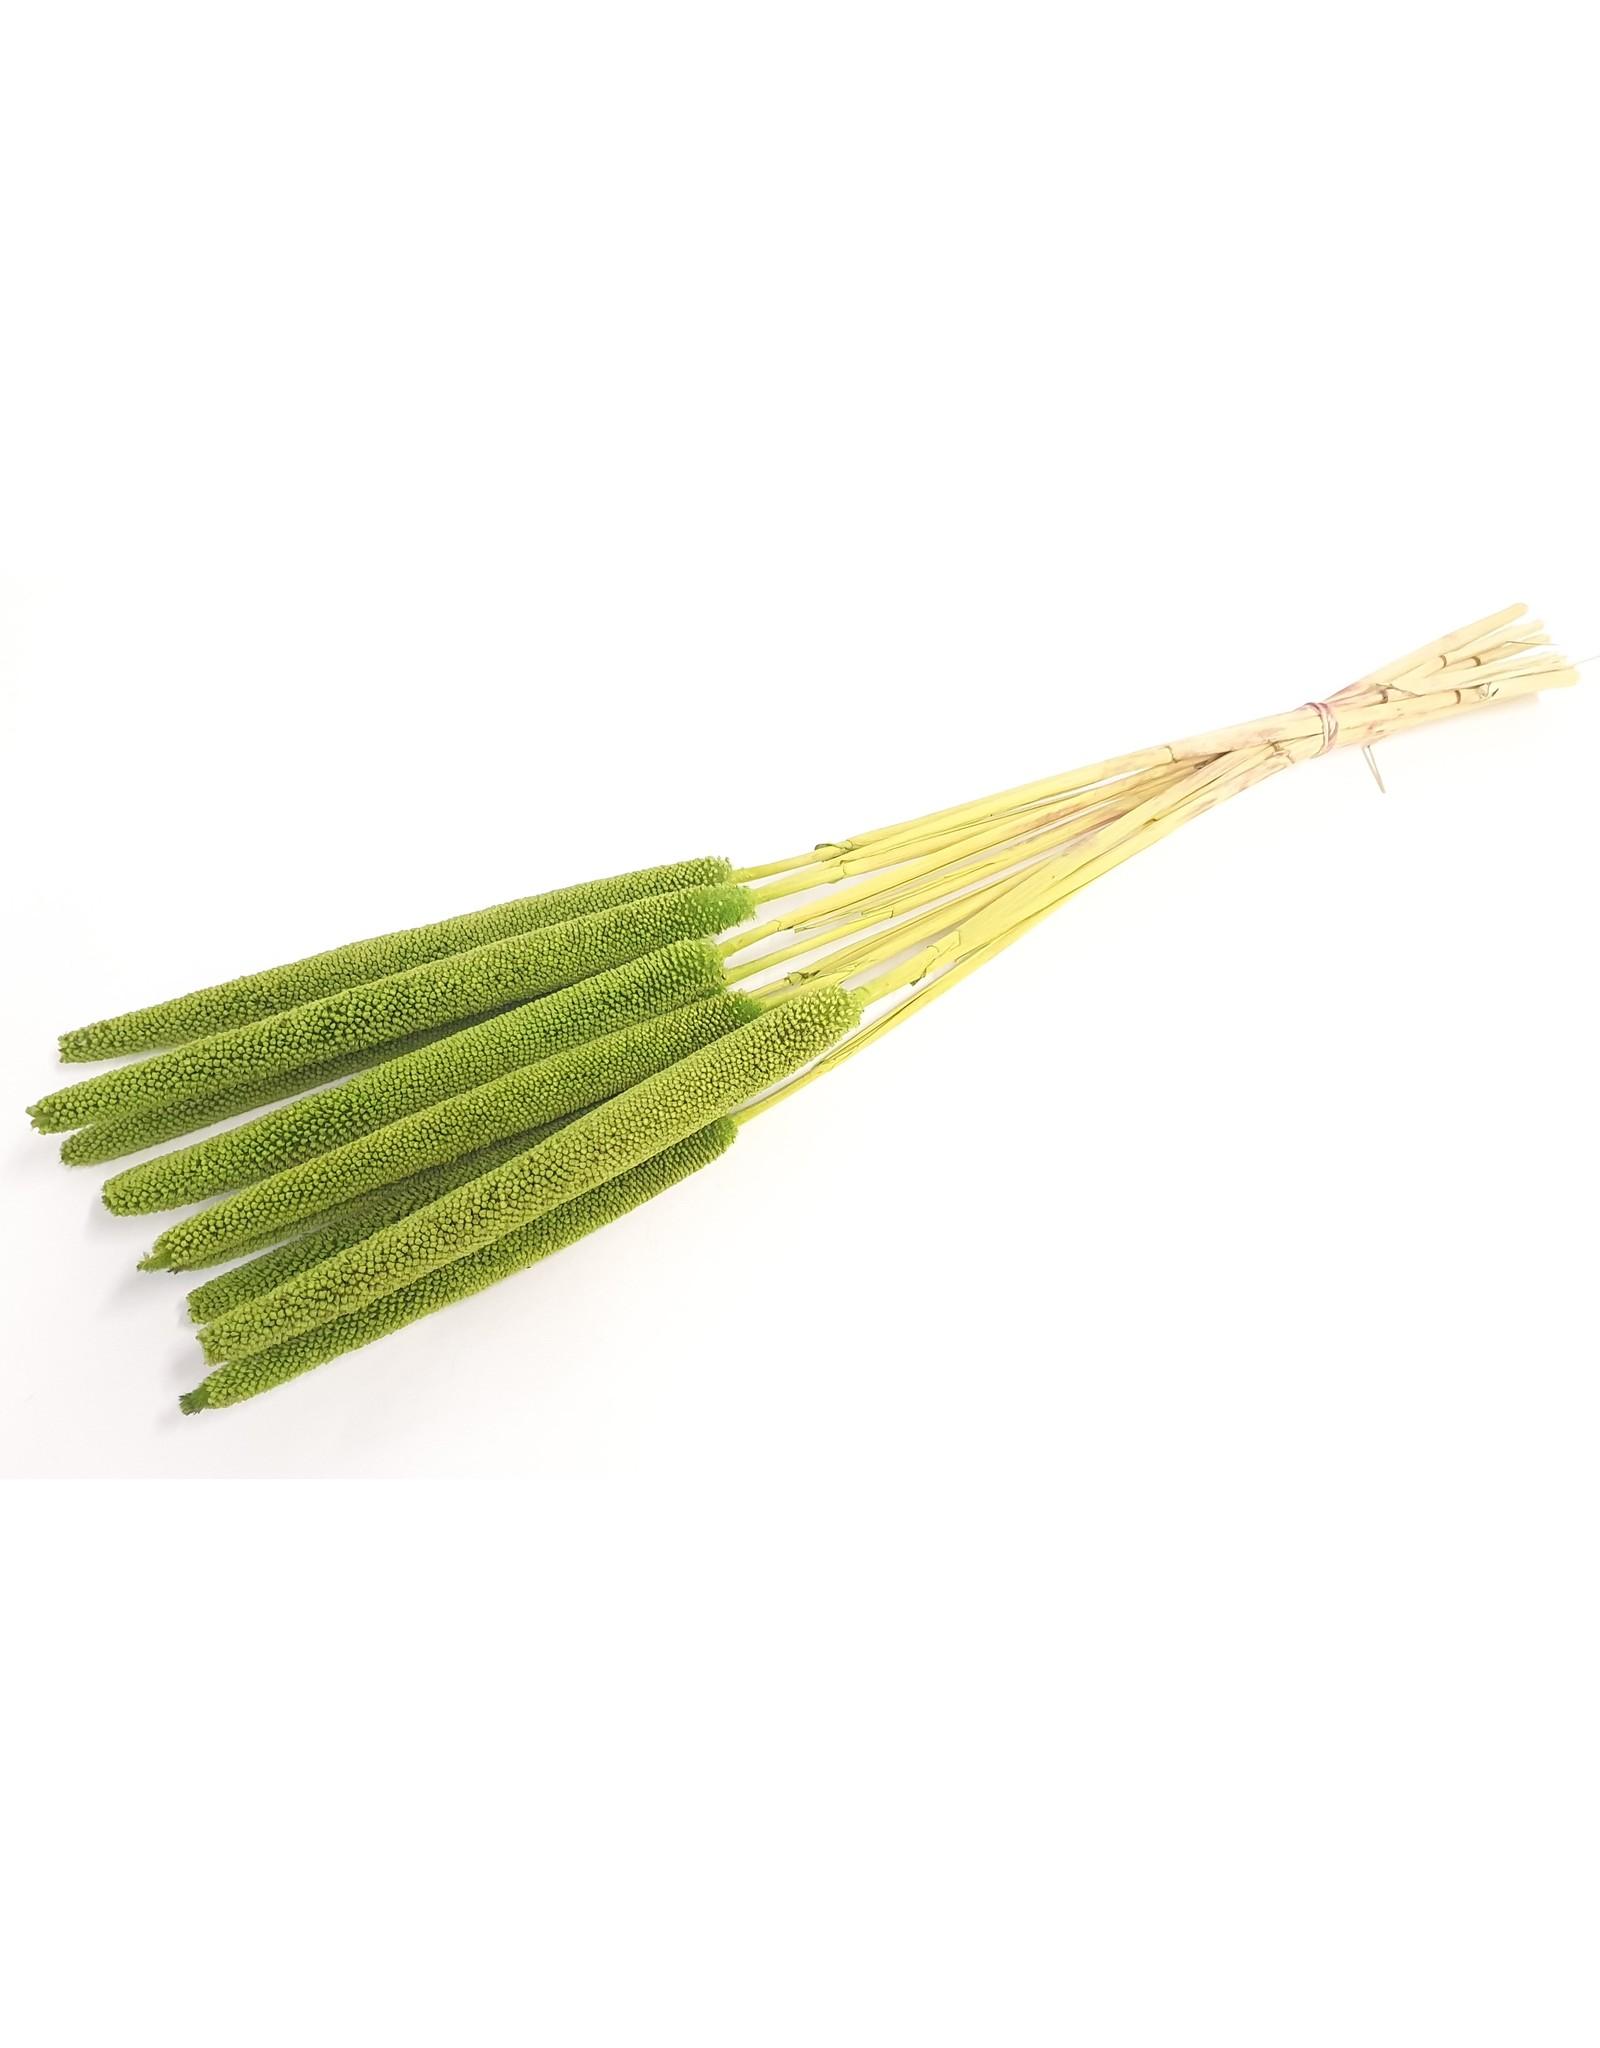 Babala on natural stem Hot light green x 100